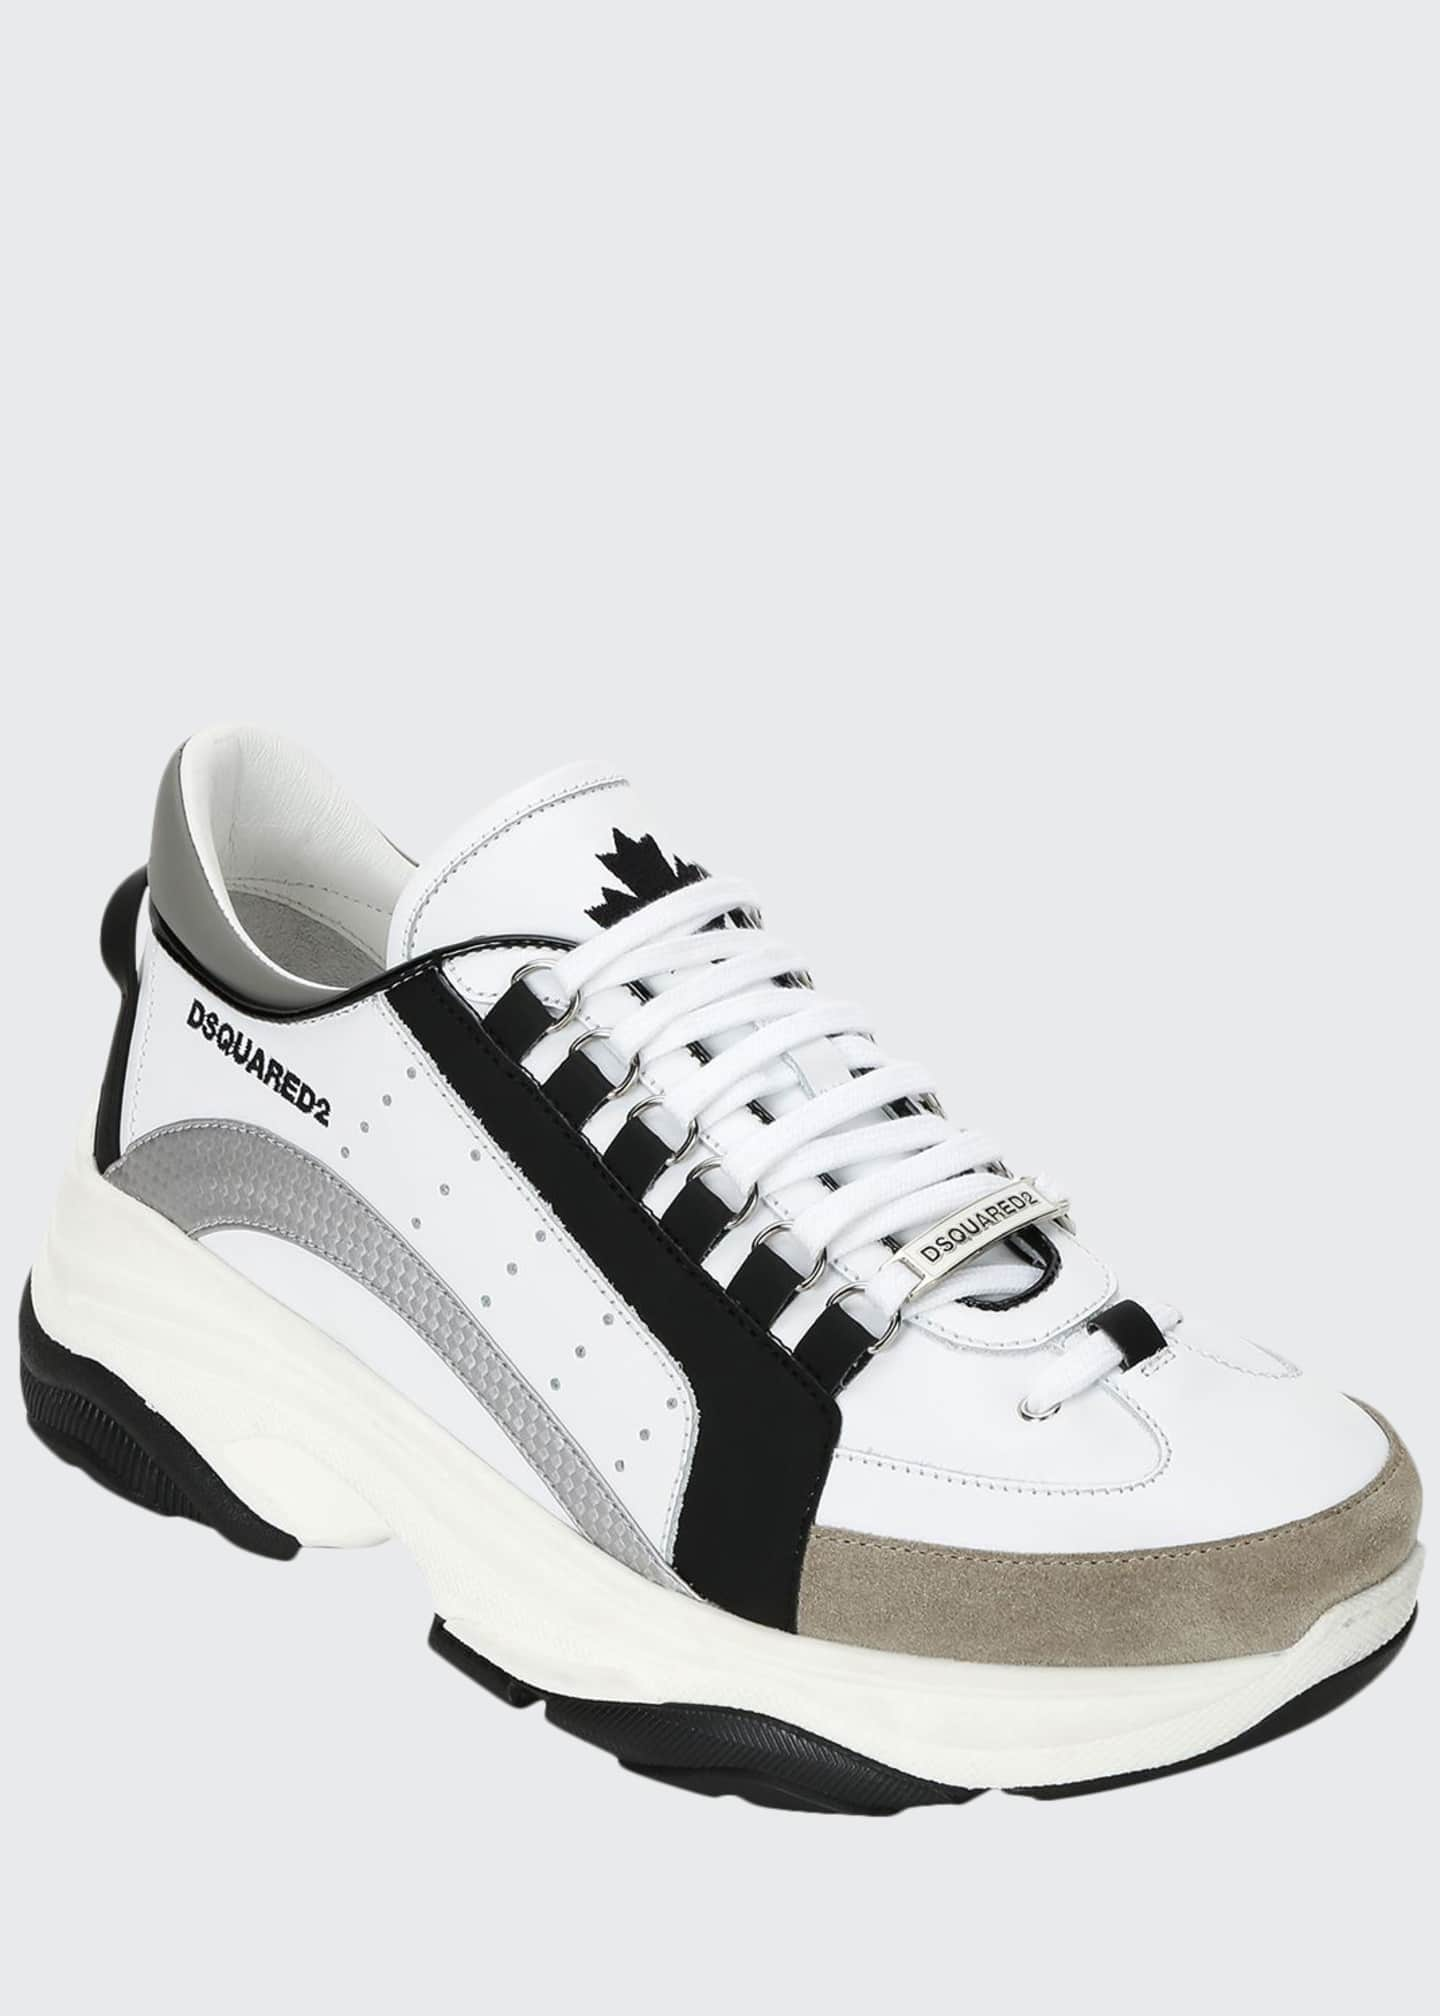 Dsquared2 Men's Colorblock Chunky Runner Sneakers, Black/White